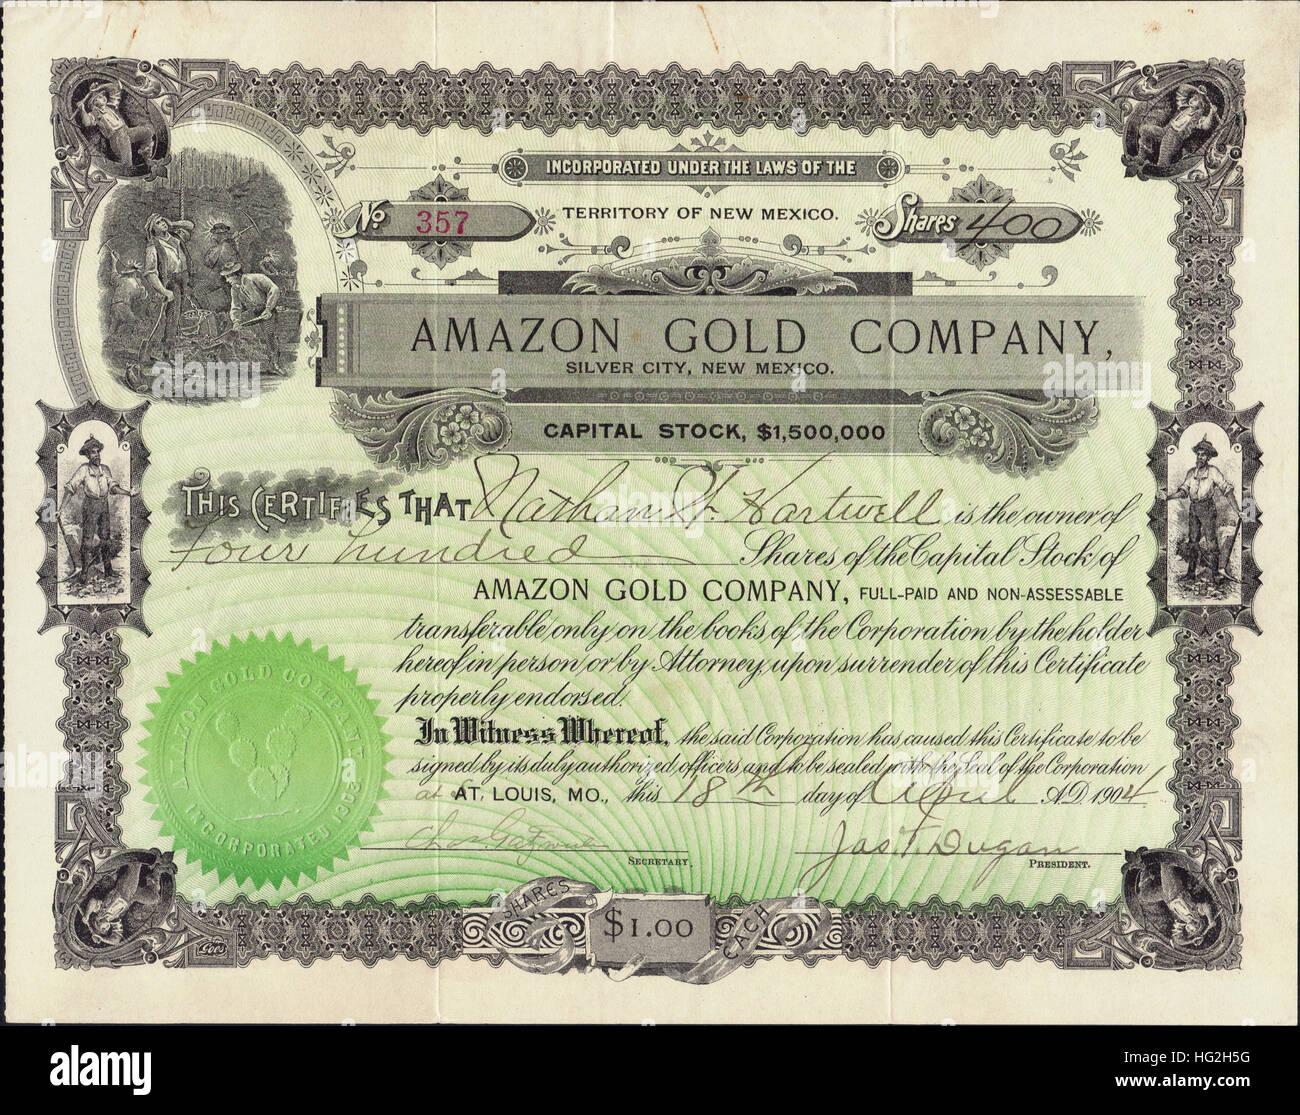 1904 Amazon Gold Company Stock Certificate Silver City New